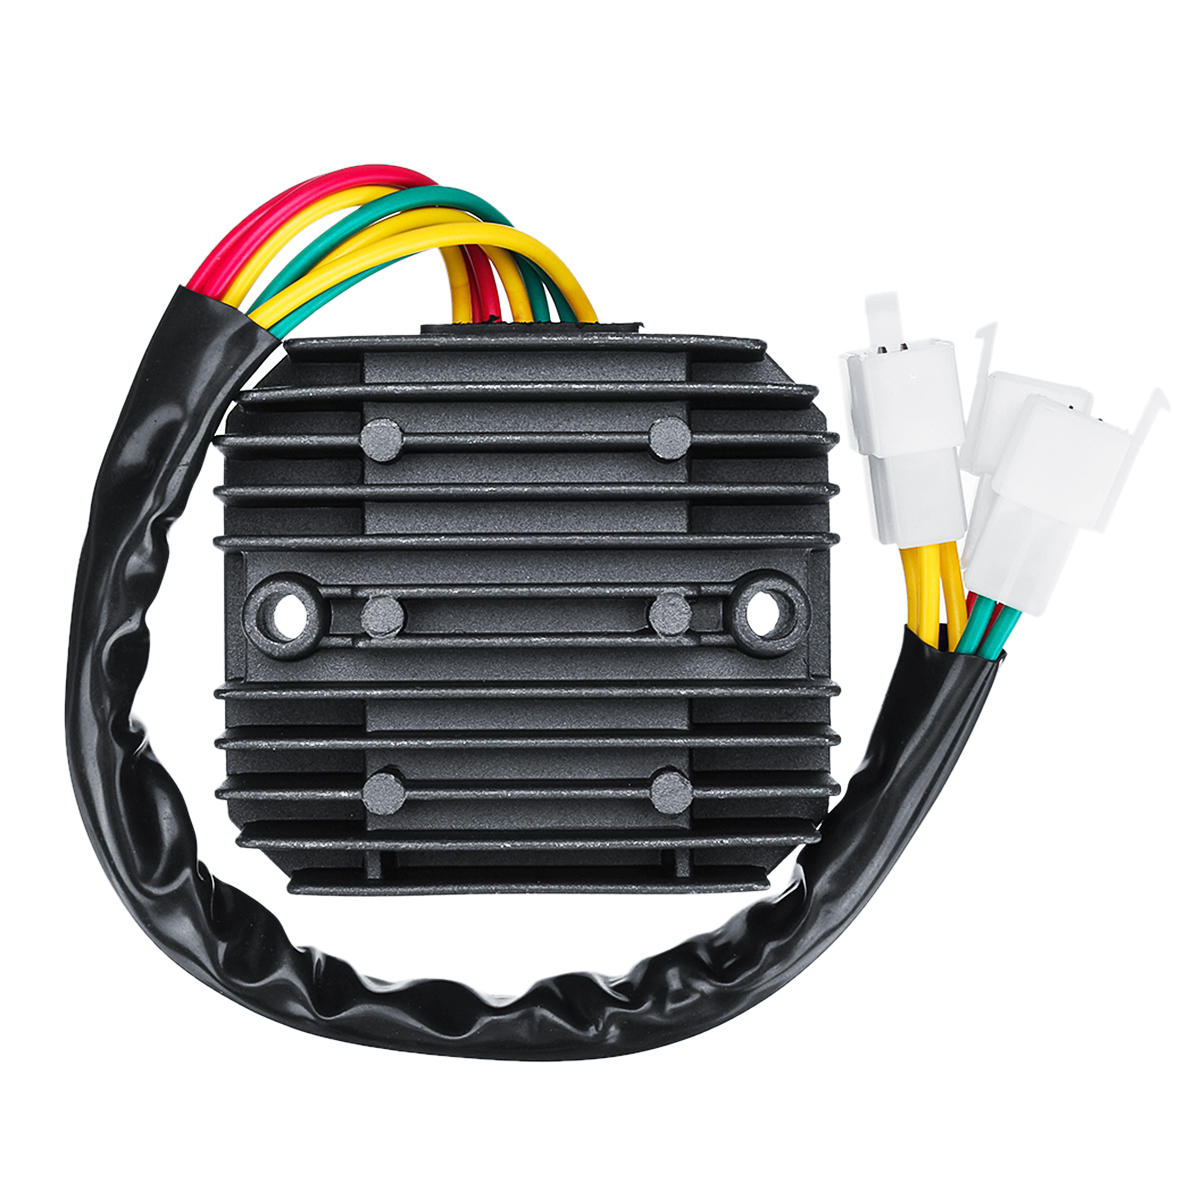 hight resolution of motorcycle voltage rectifier regulator for honda vt1100 vt 1100 c2 2 ace 97 98 cod